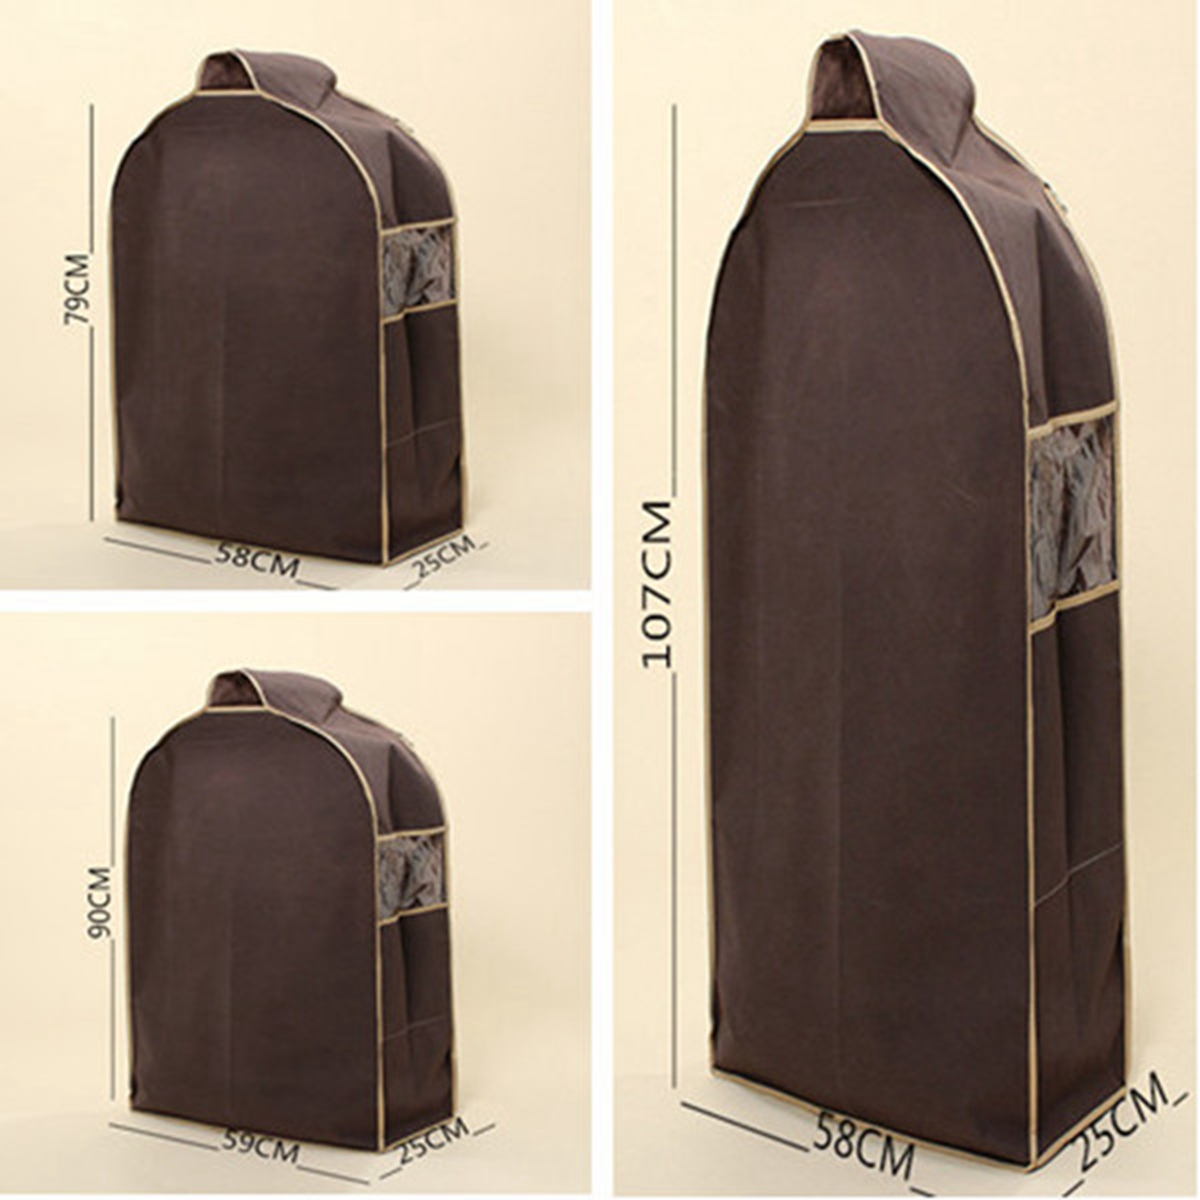 wardrobe hanging suit clothing overcoat dust cover garment storage bag organizer. Black Bedroom Furniture Sets. Home Design Ideas